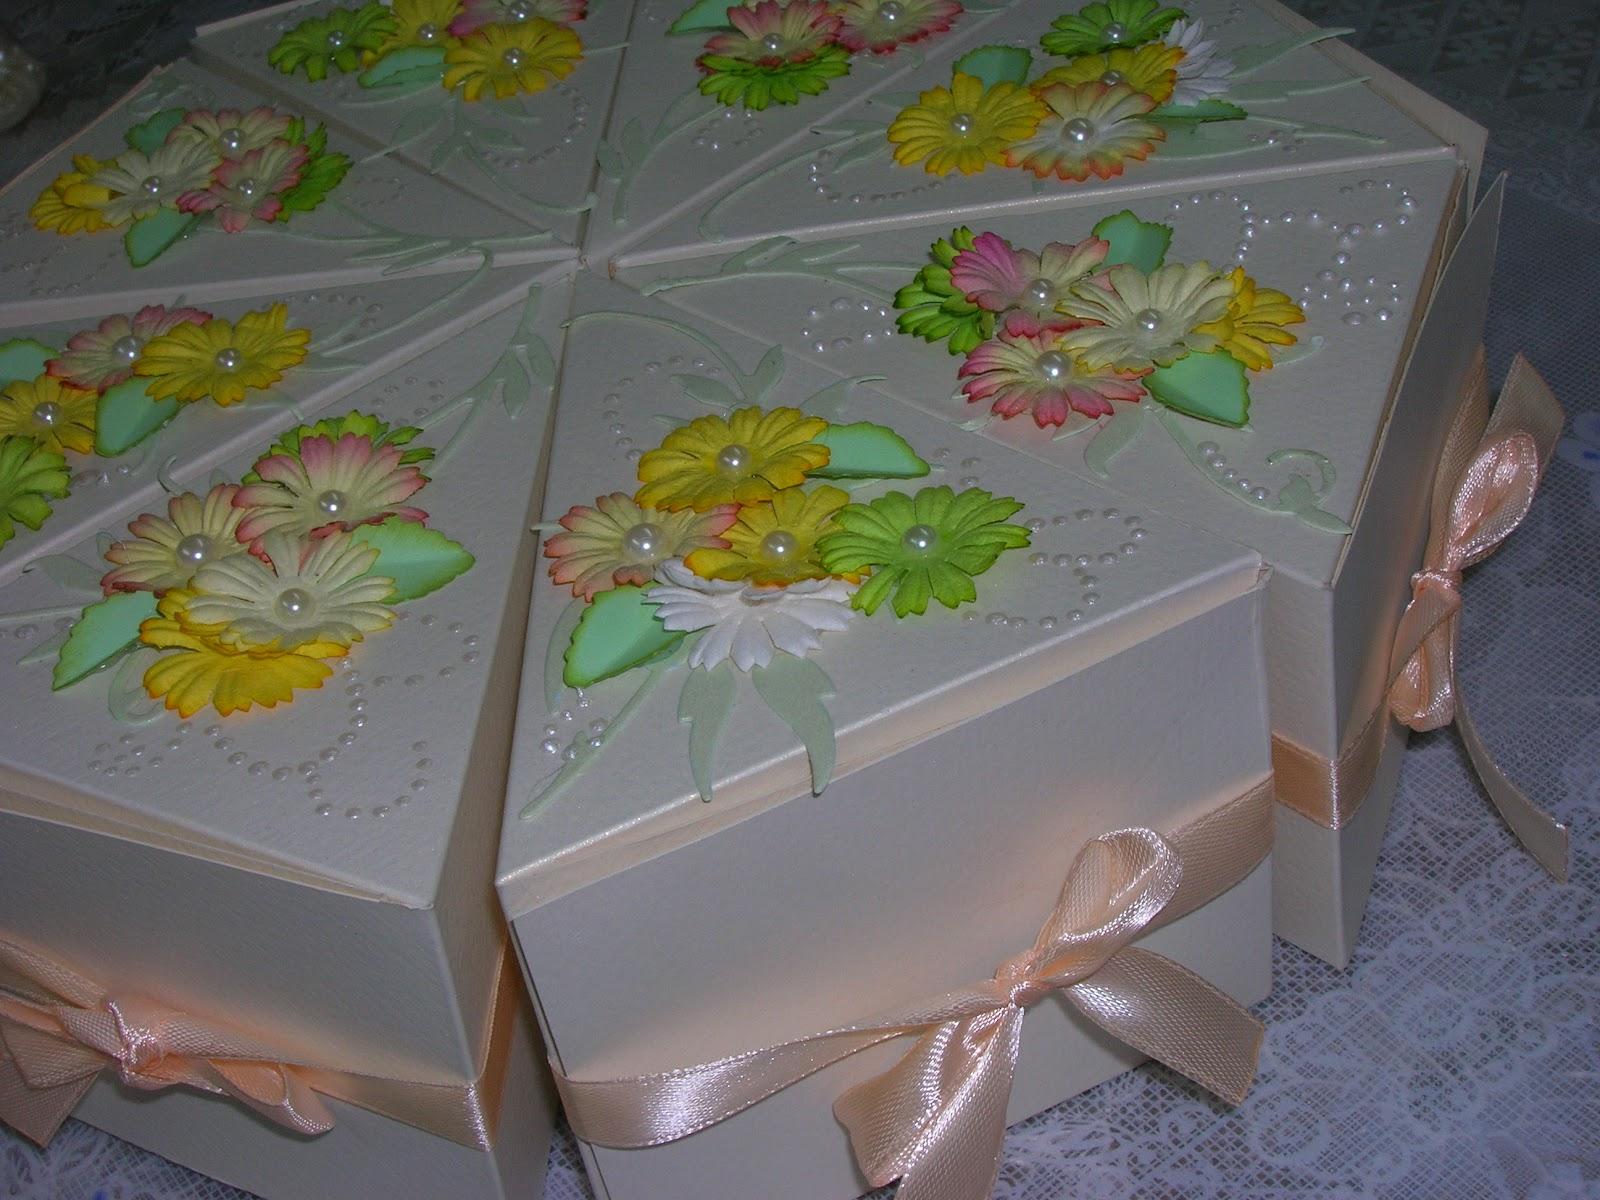 Что дарят на свадьбу родители жениха - идеи подарков, фото 71